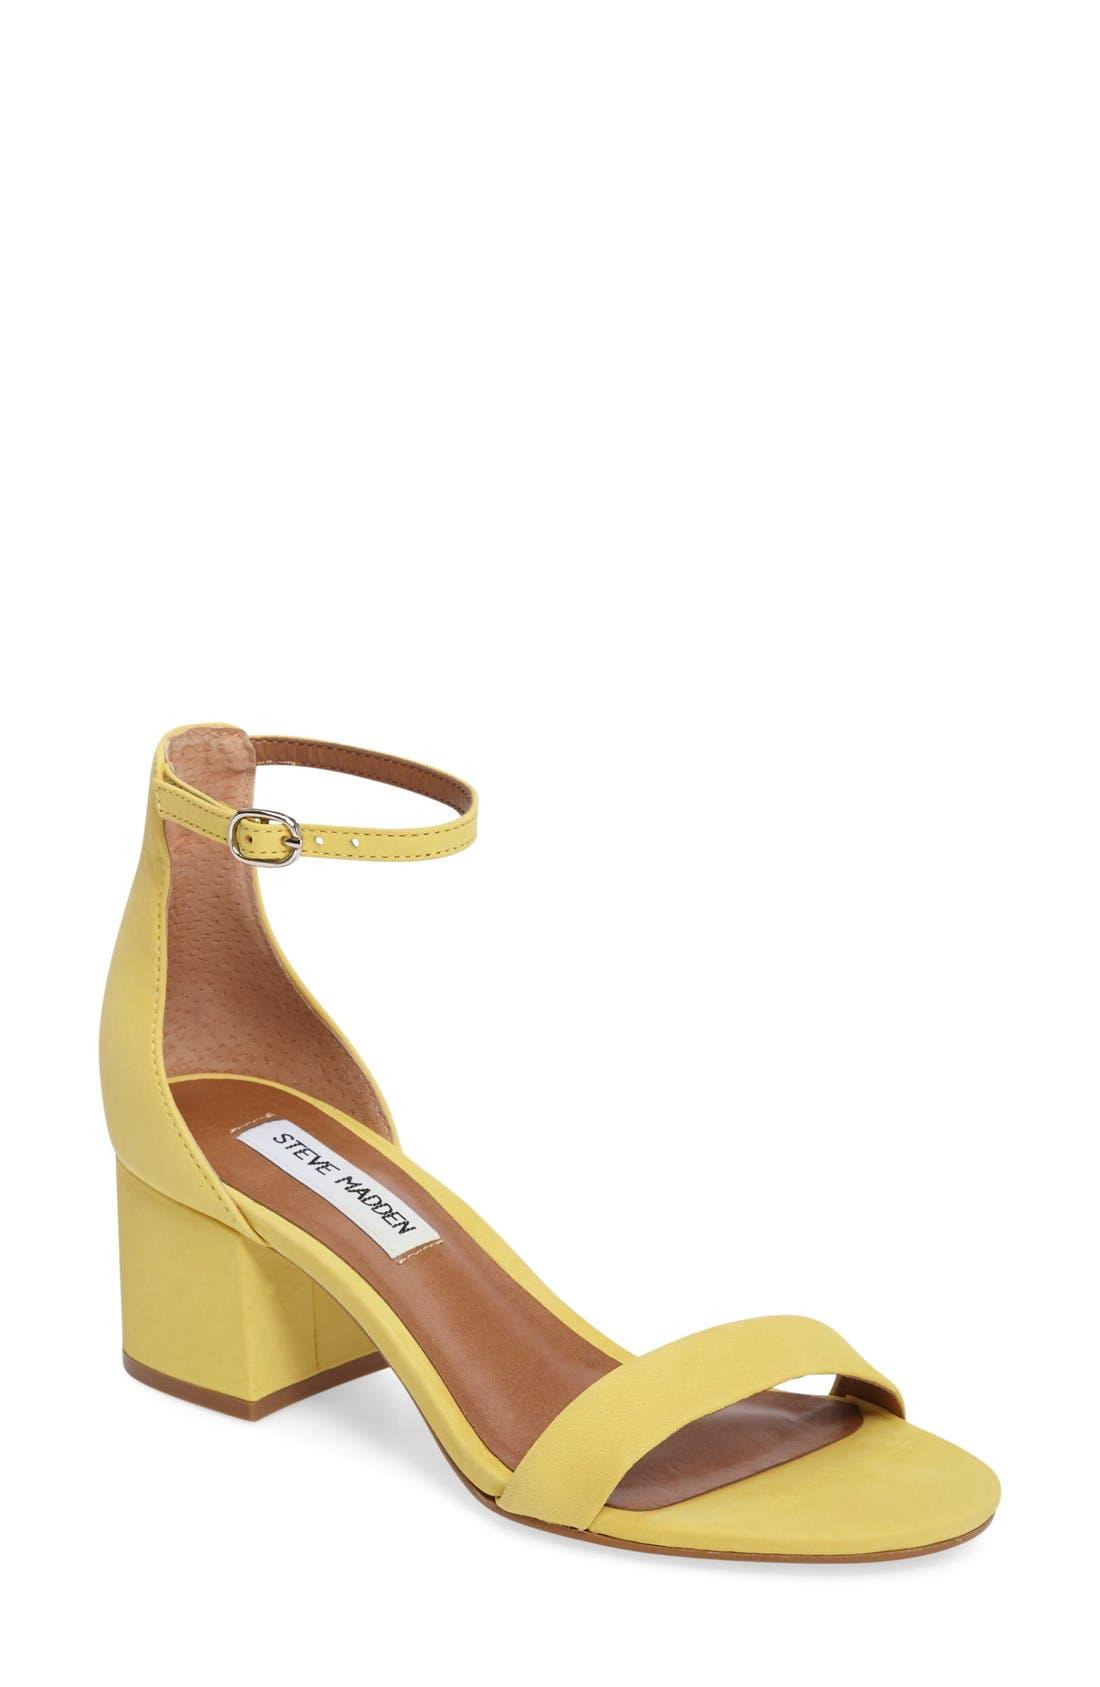 Irenee Ankle Strap Sandal,                             Main thumbnail 28, color,